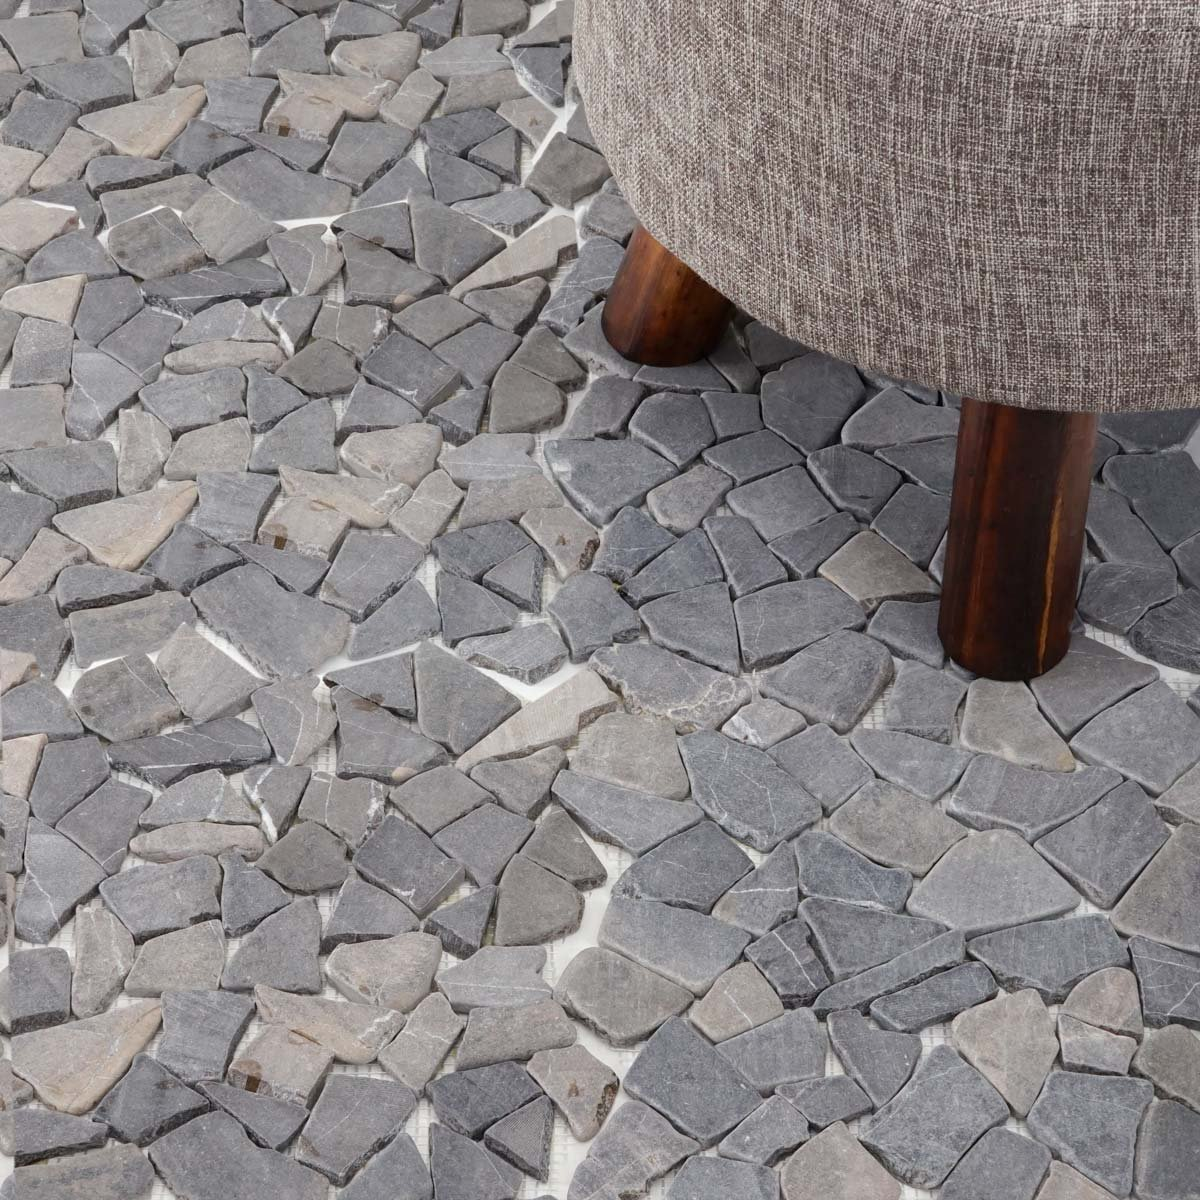 Mendler Piastrelle per Pavimento e Parete Vigo T687 Marmo Mosaico 30x30cm 11 Pezzi 1mq ~ Grigio